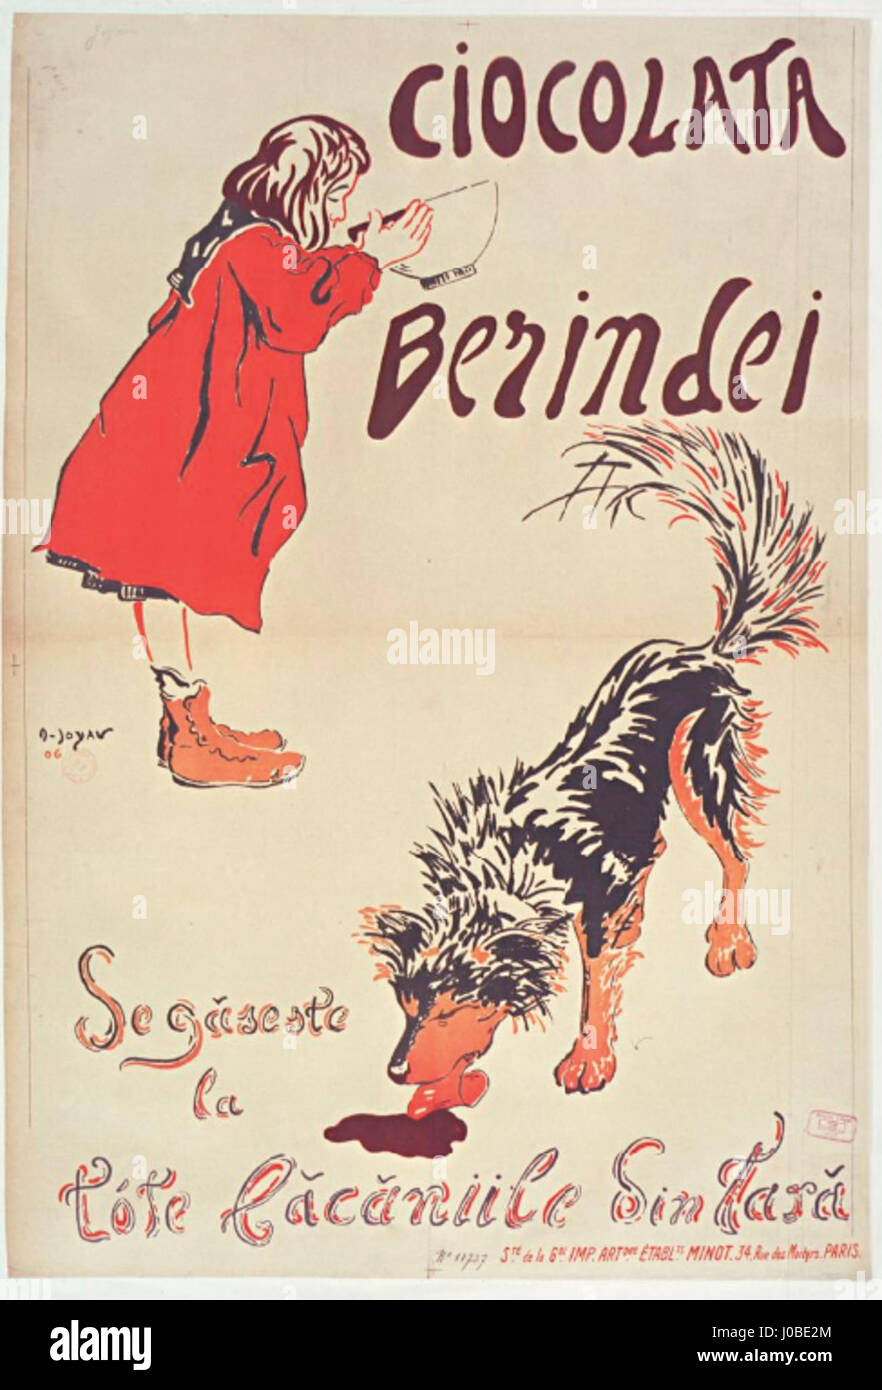 Ciocolata Berindei poster Joyau Amédée Foto Stock